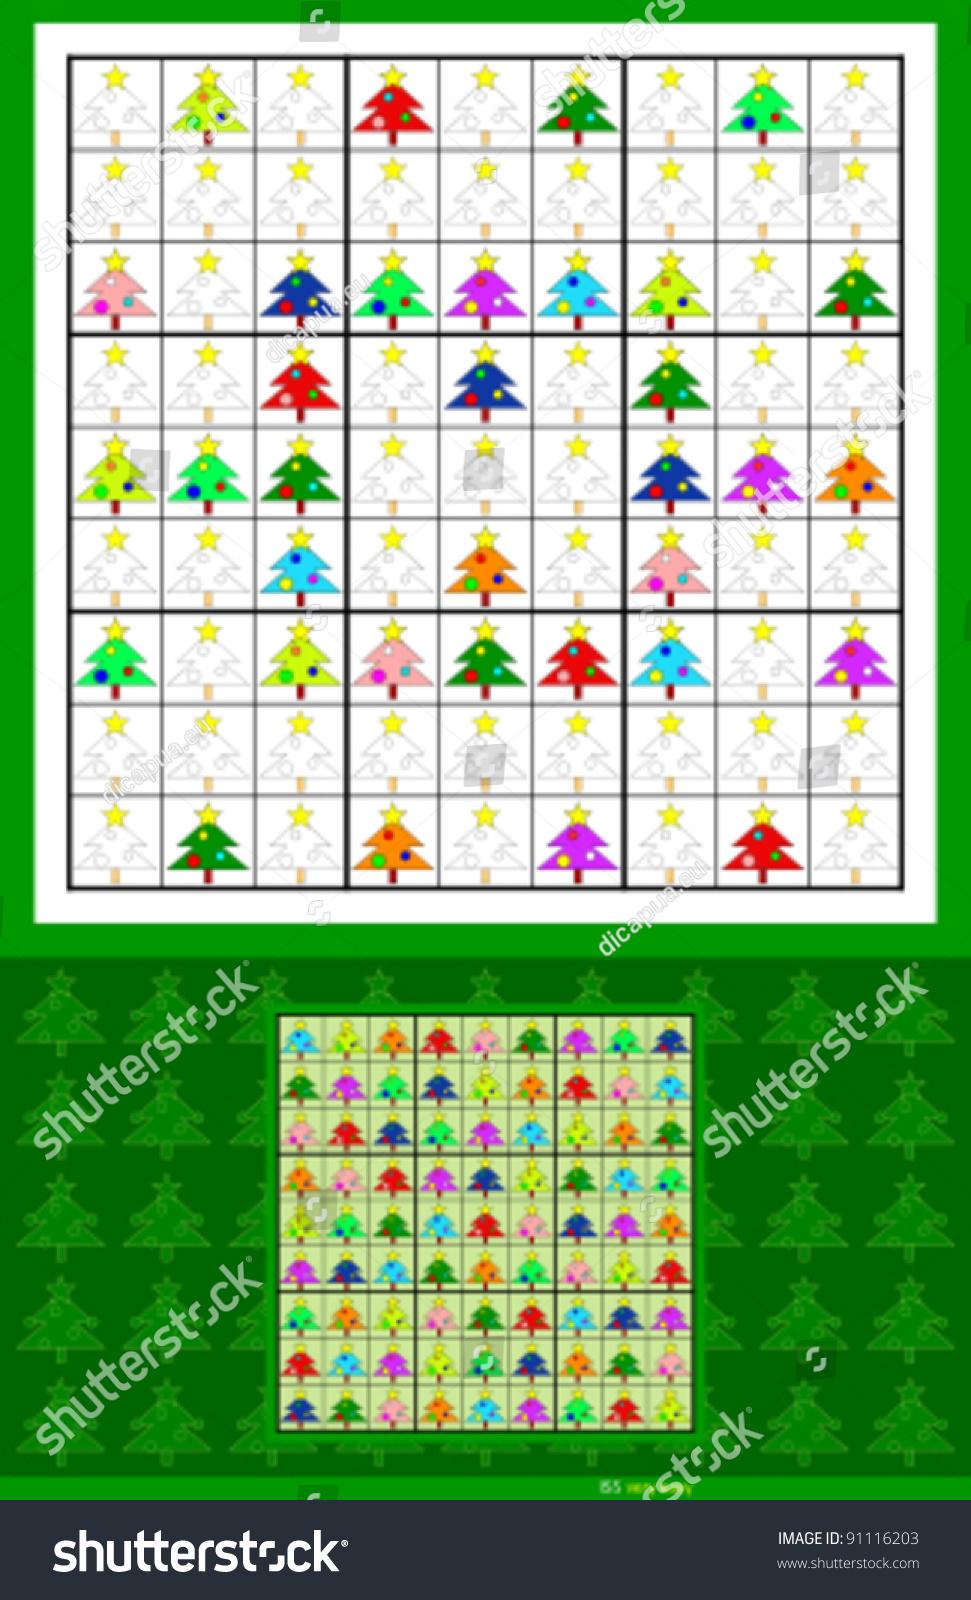 Christmas Sudoku.Christmas Sudoku Symmetrical Very Easy 34 Stock Vector